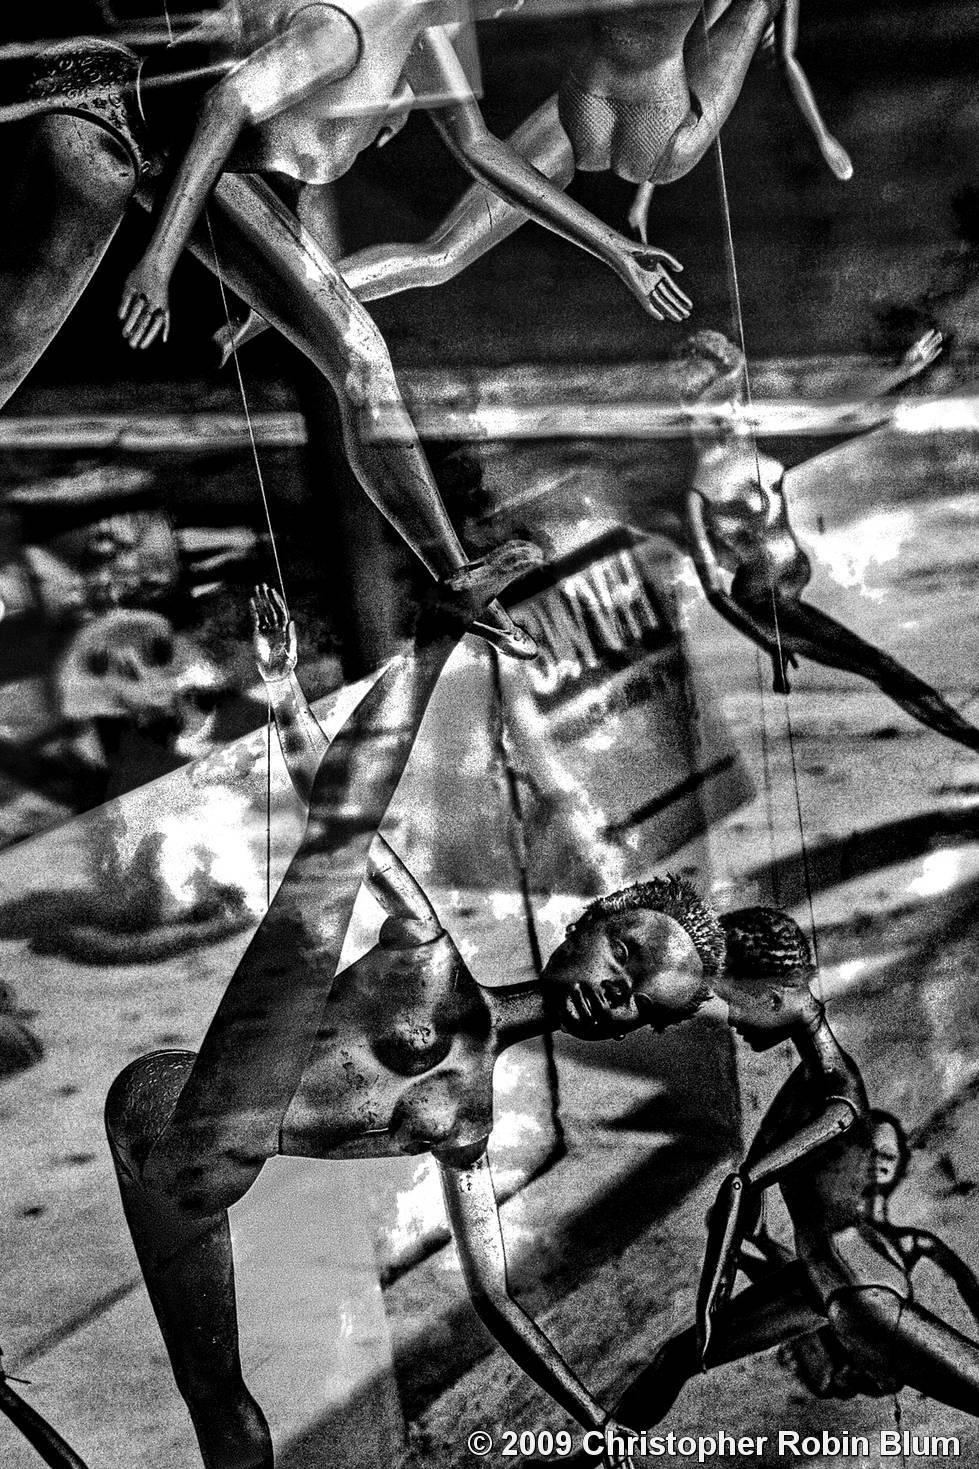 Anti-Gravity by Christopher Robin Blum | Black & White